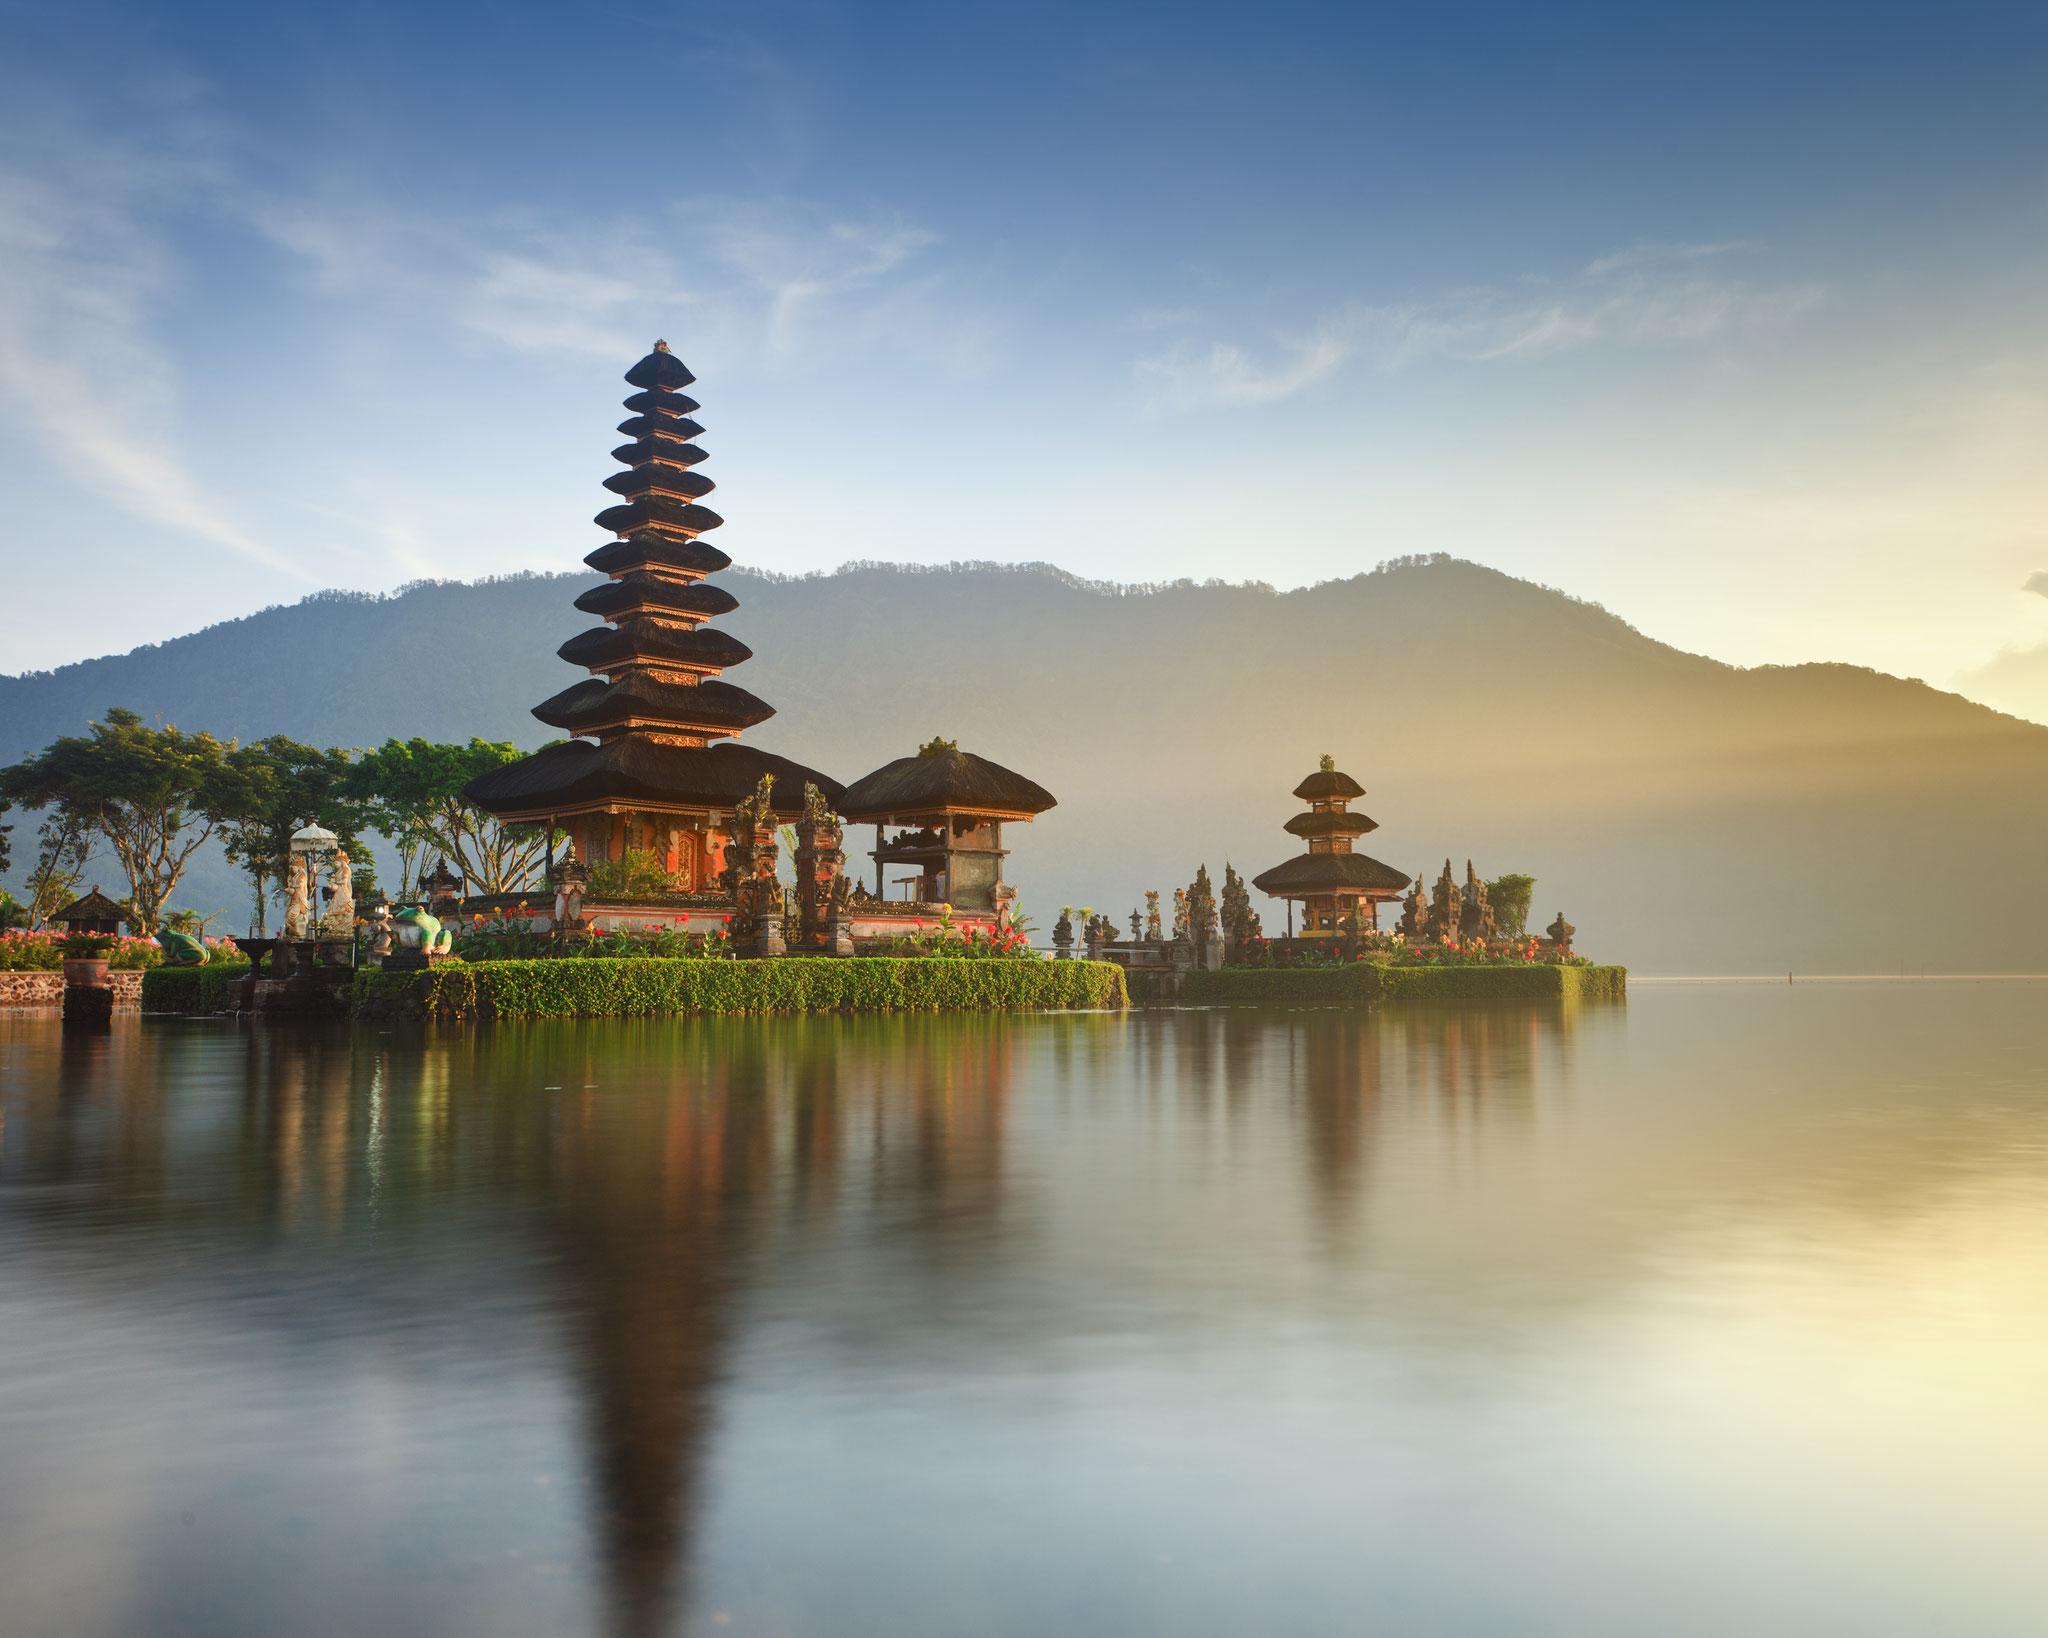 Ulun Danu Tempel beim Beratan See